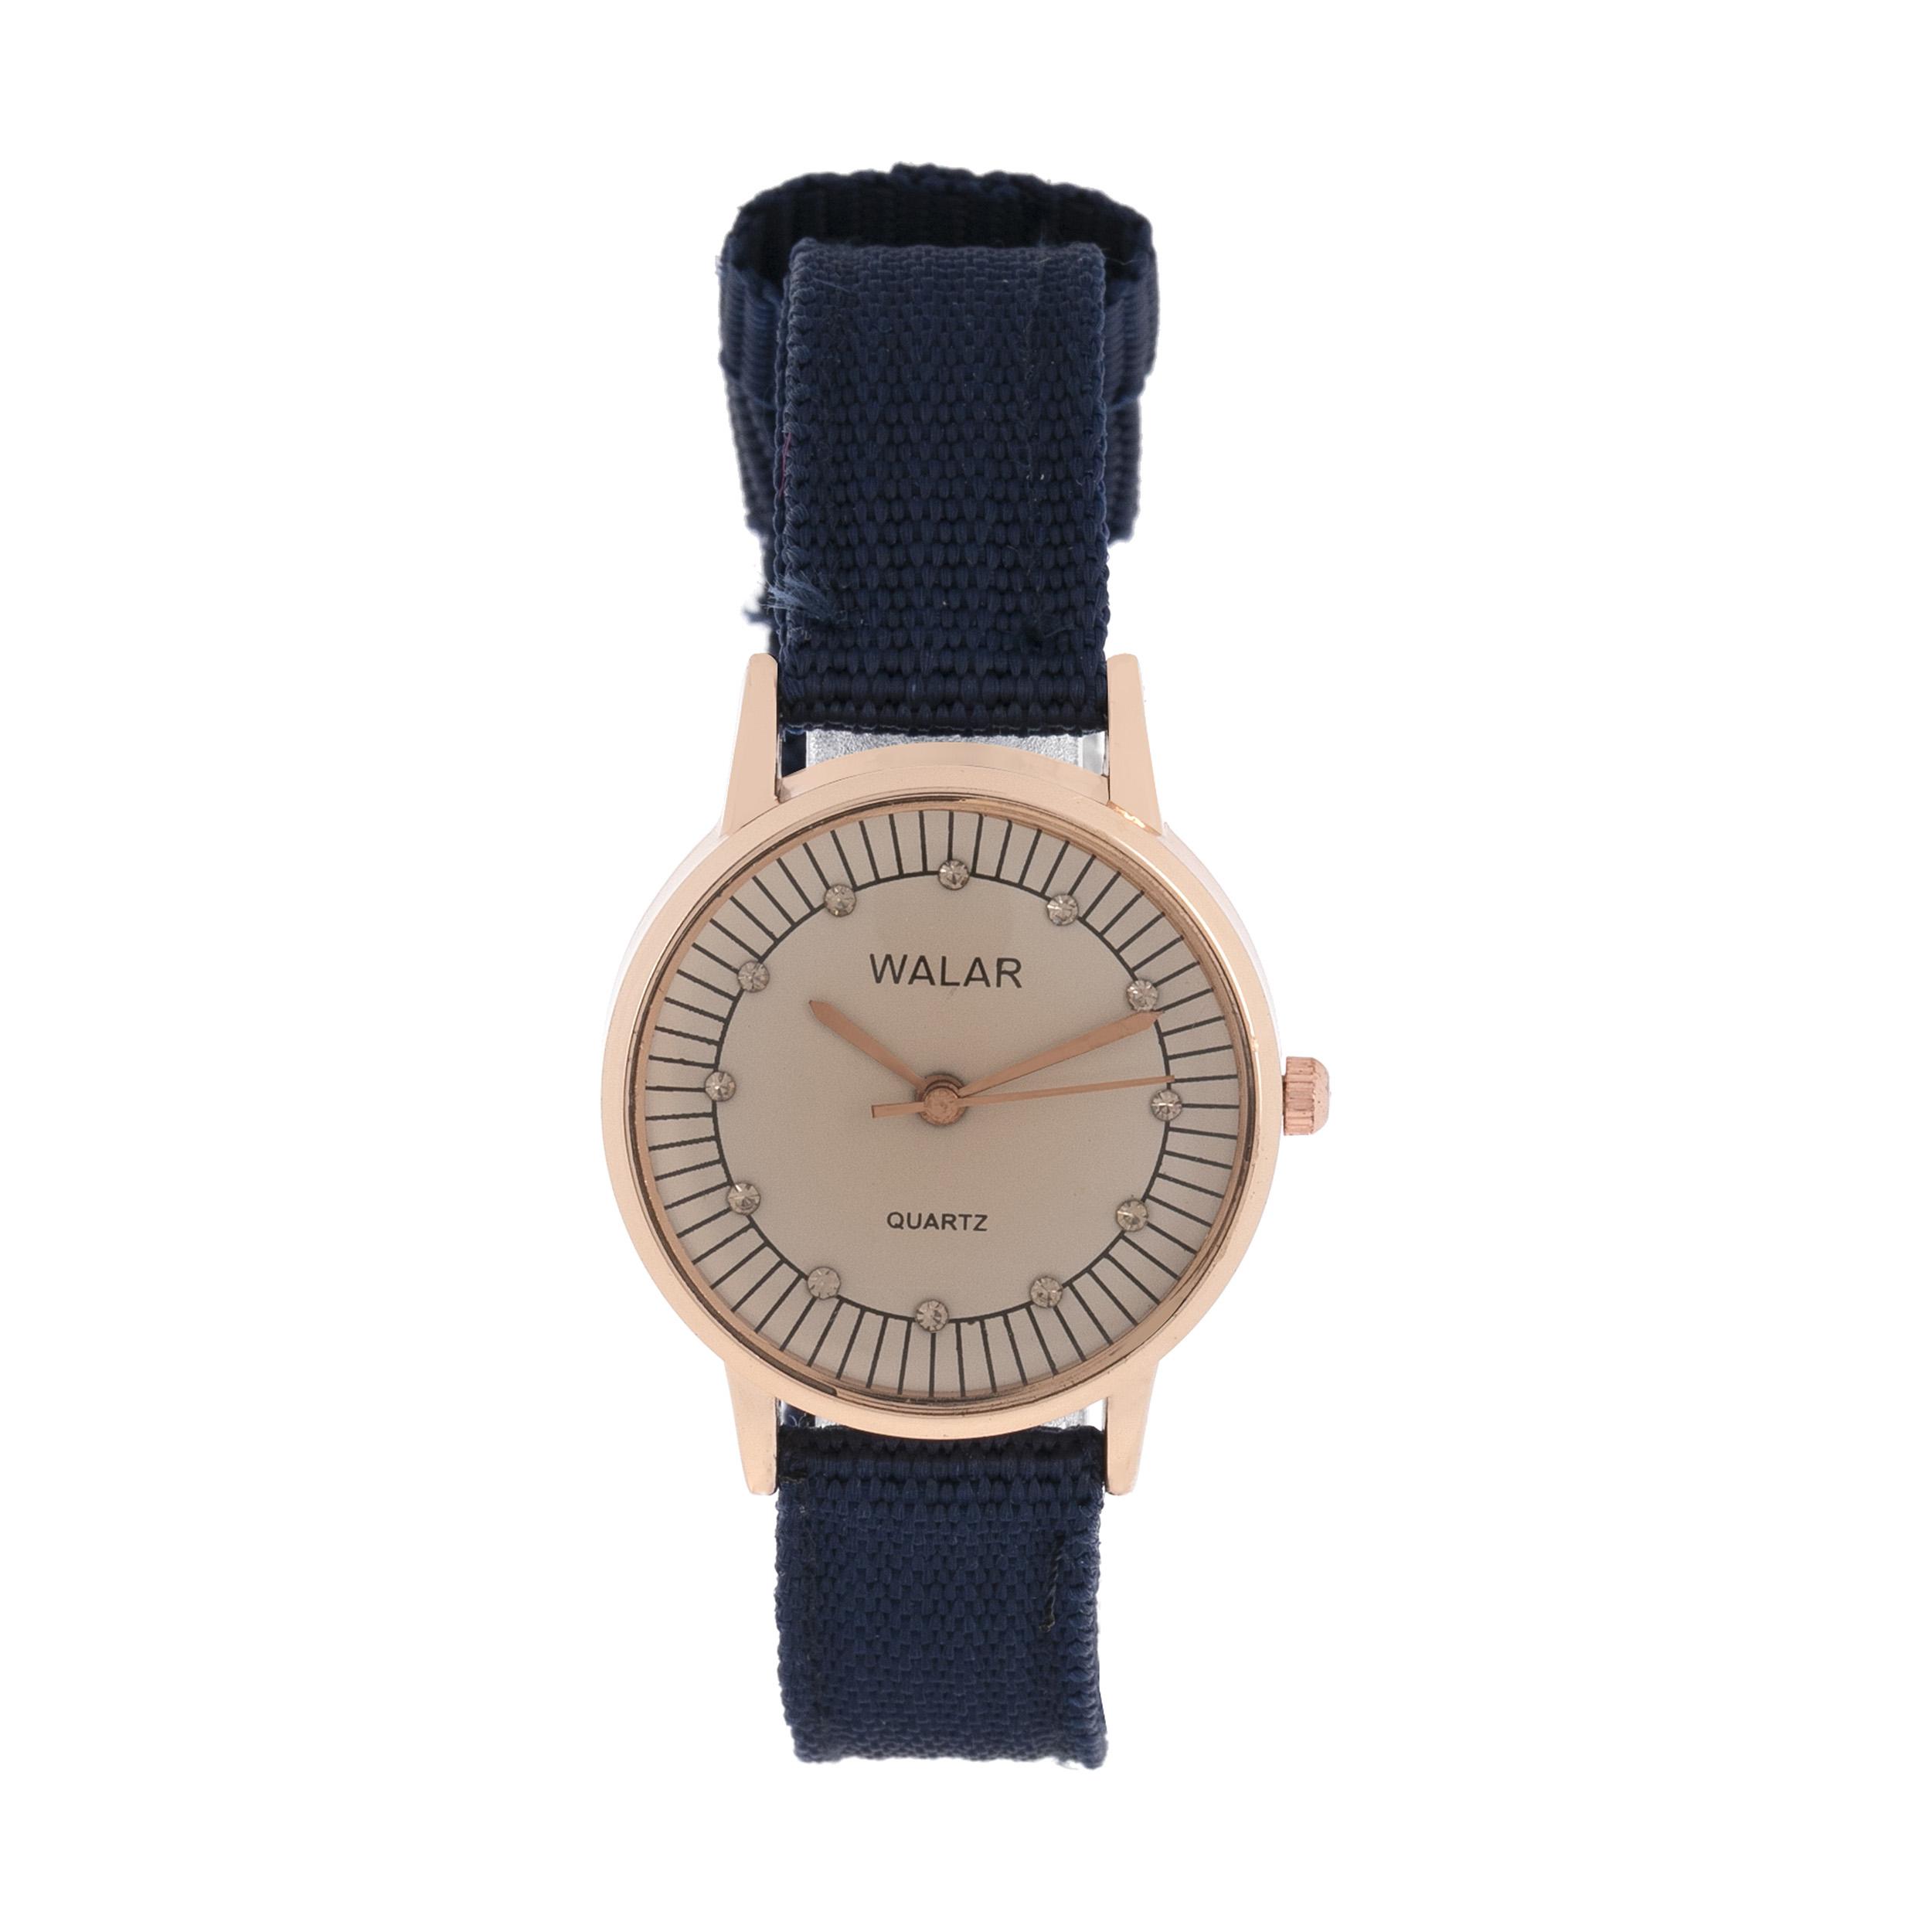 ساعت زنانه برند والار کد 0142